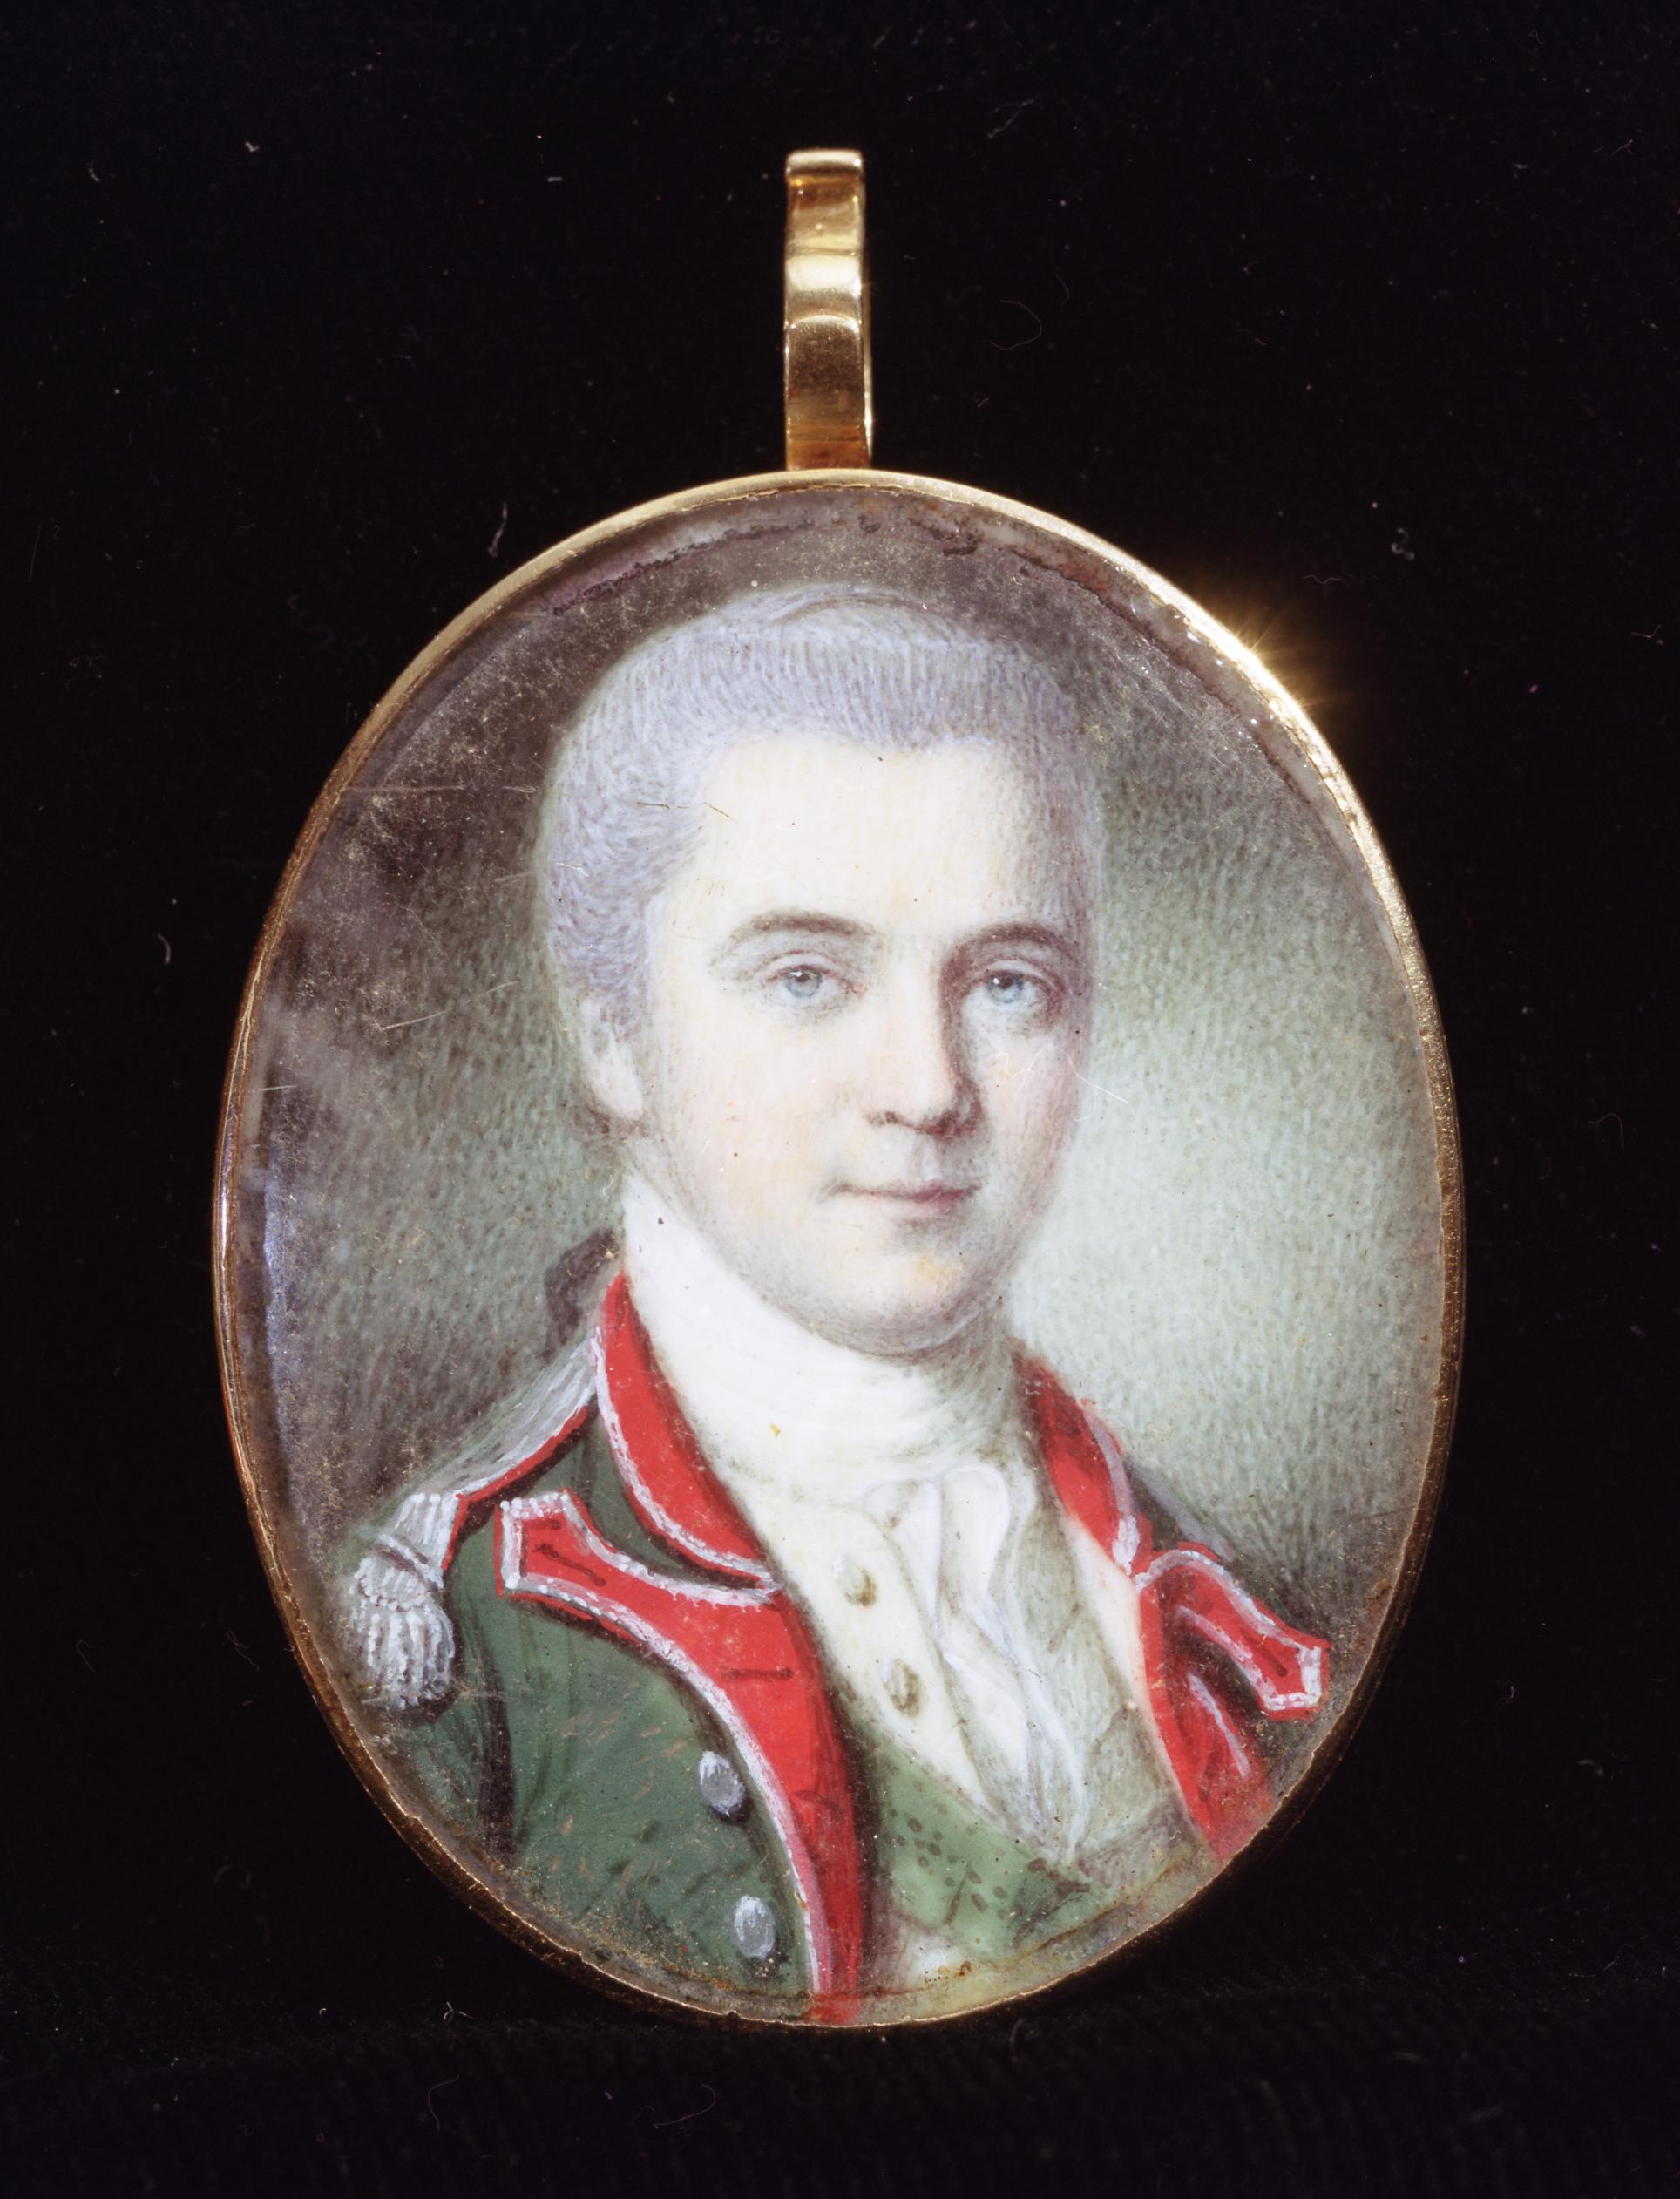 James Hamilton portrait miniature by Charles Willson Peale, ca. 1778-1779